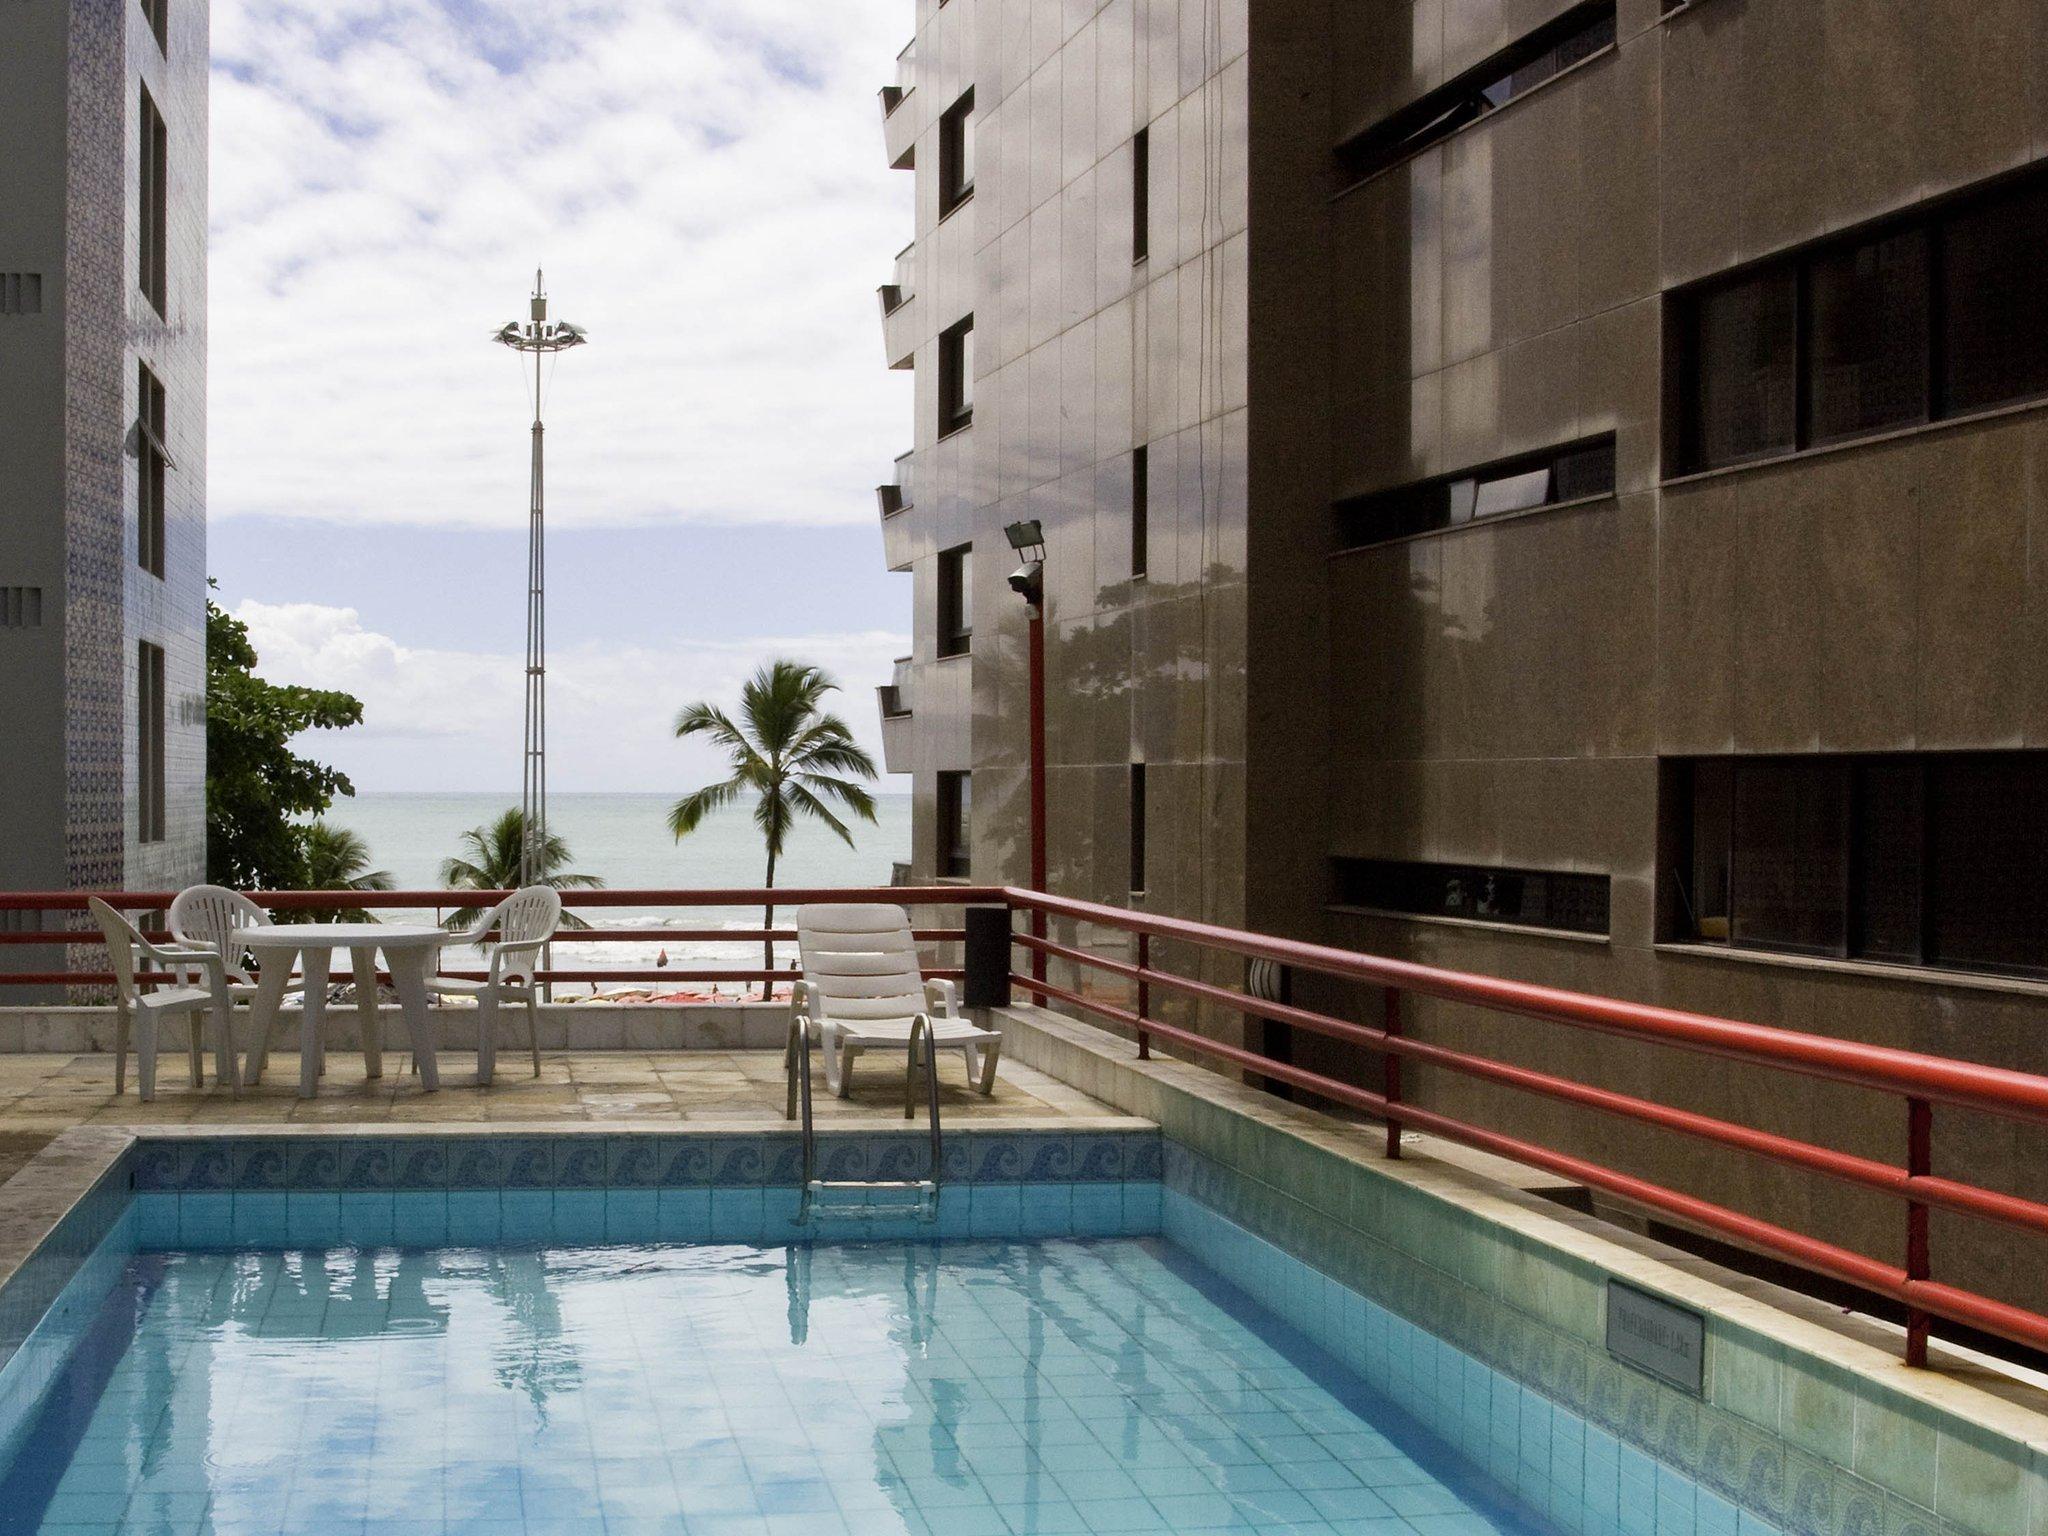 Hotel Mercure Recife Navegantes